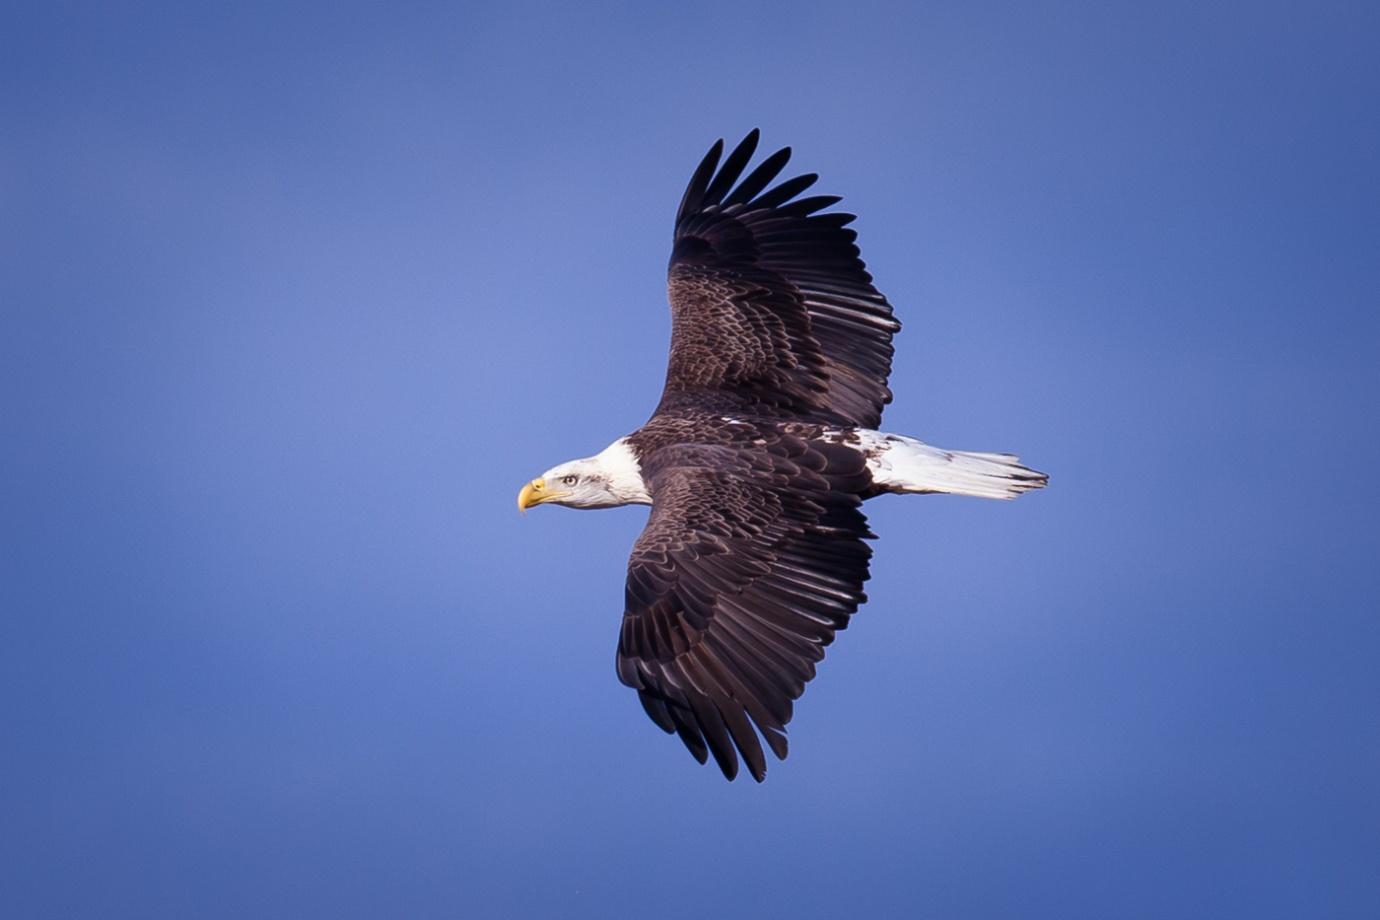 white-oak-pastures-bald-eagles-105.jpg